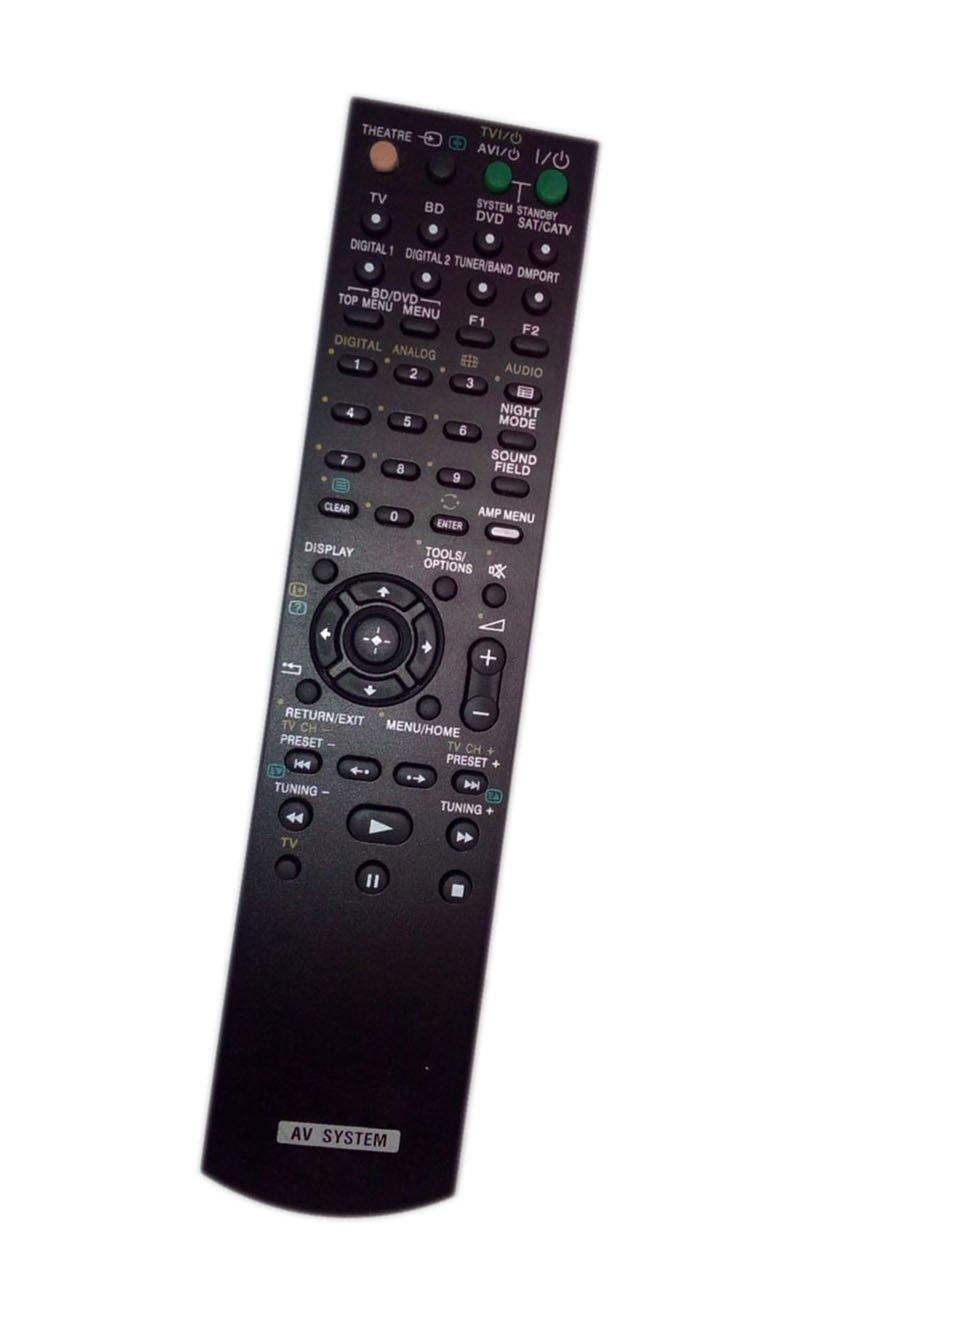 Control Remoto Sony Ss Mct100 Rm Aau029 1 4806 181 1 Htfs...